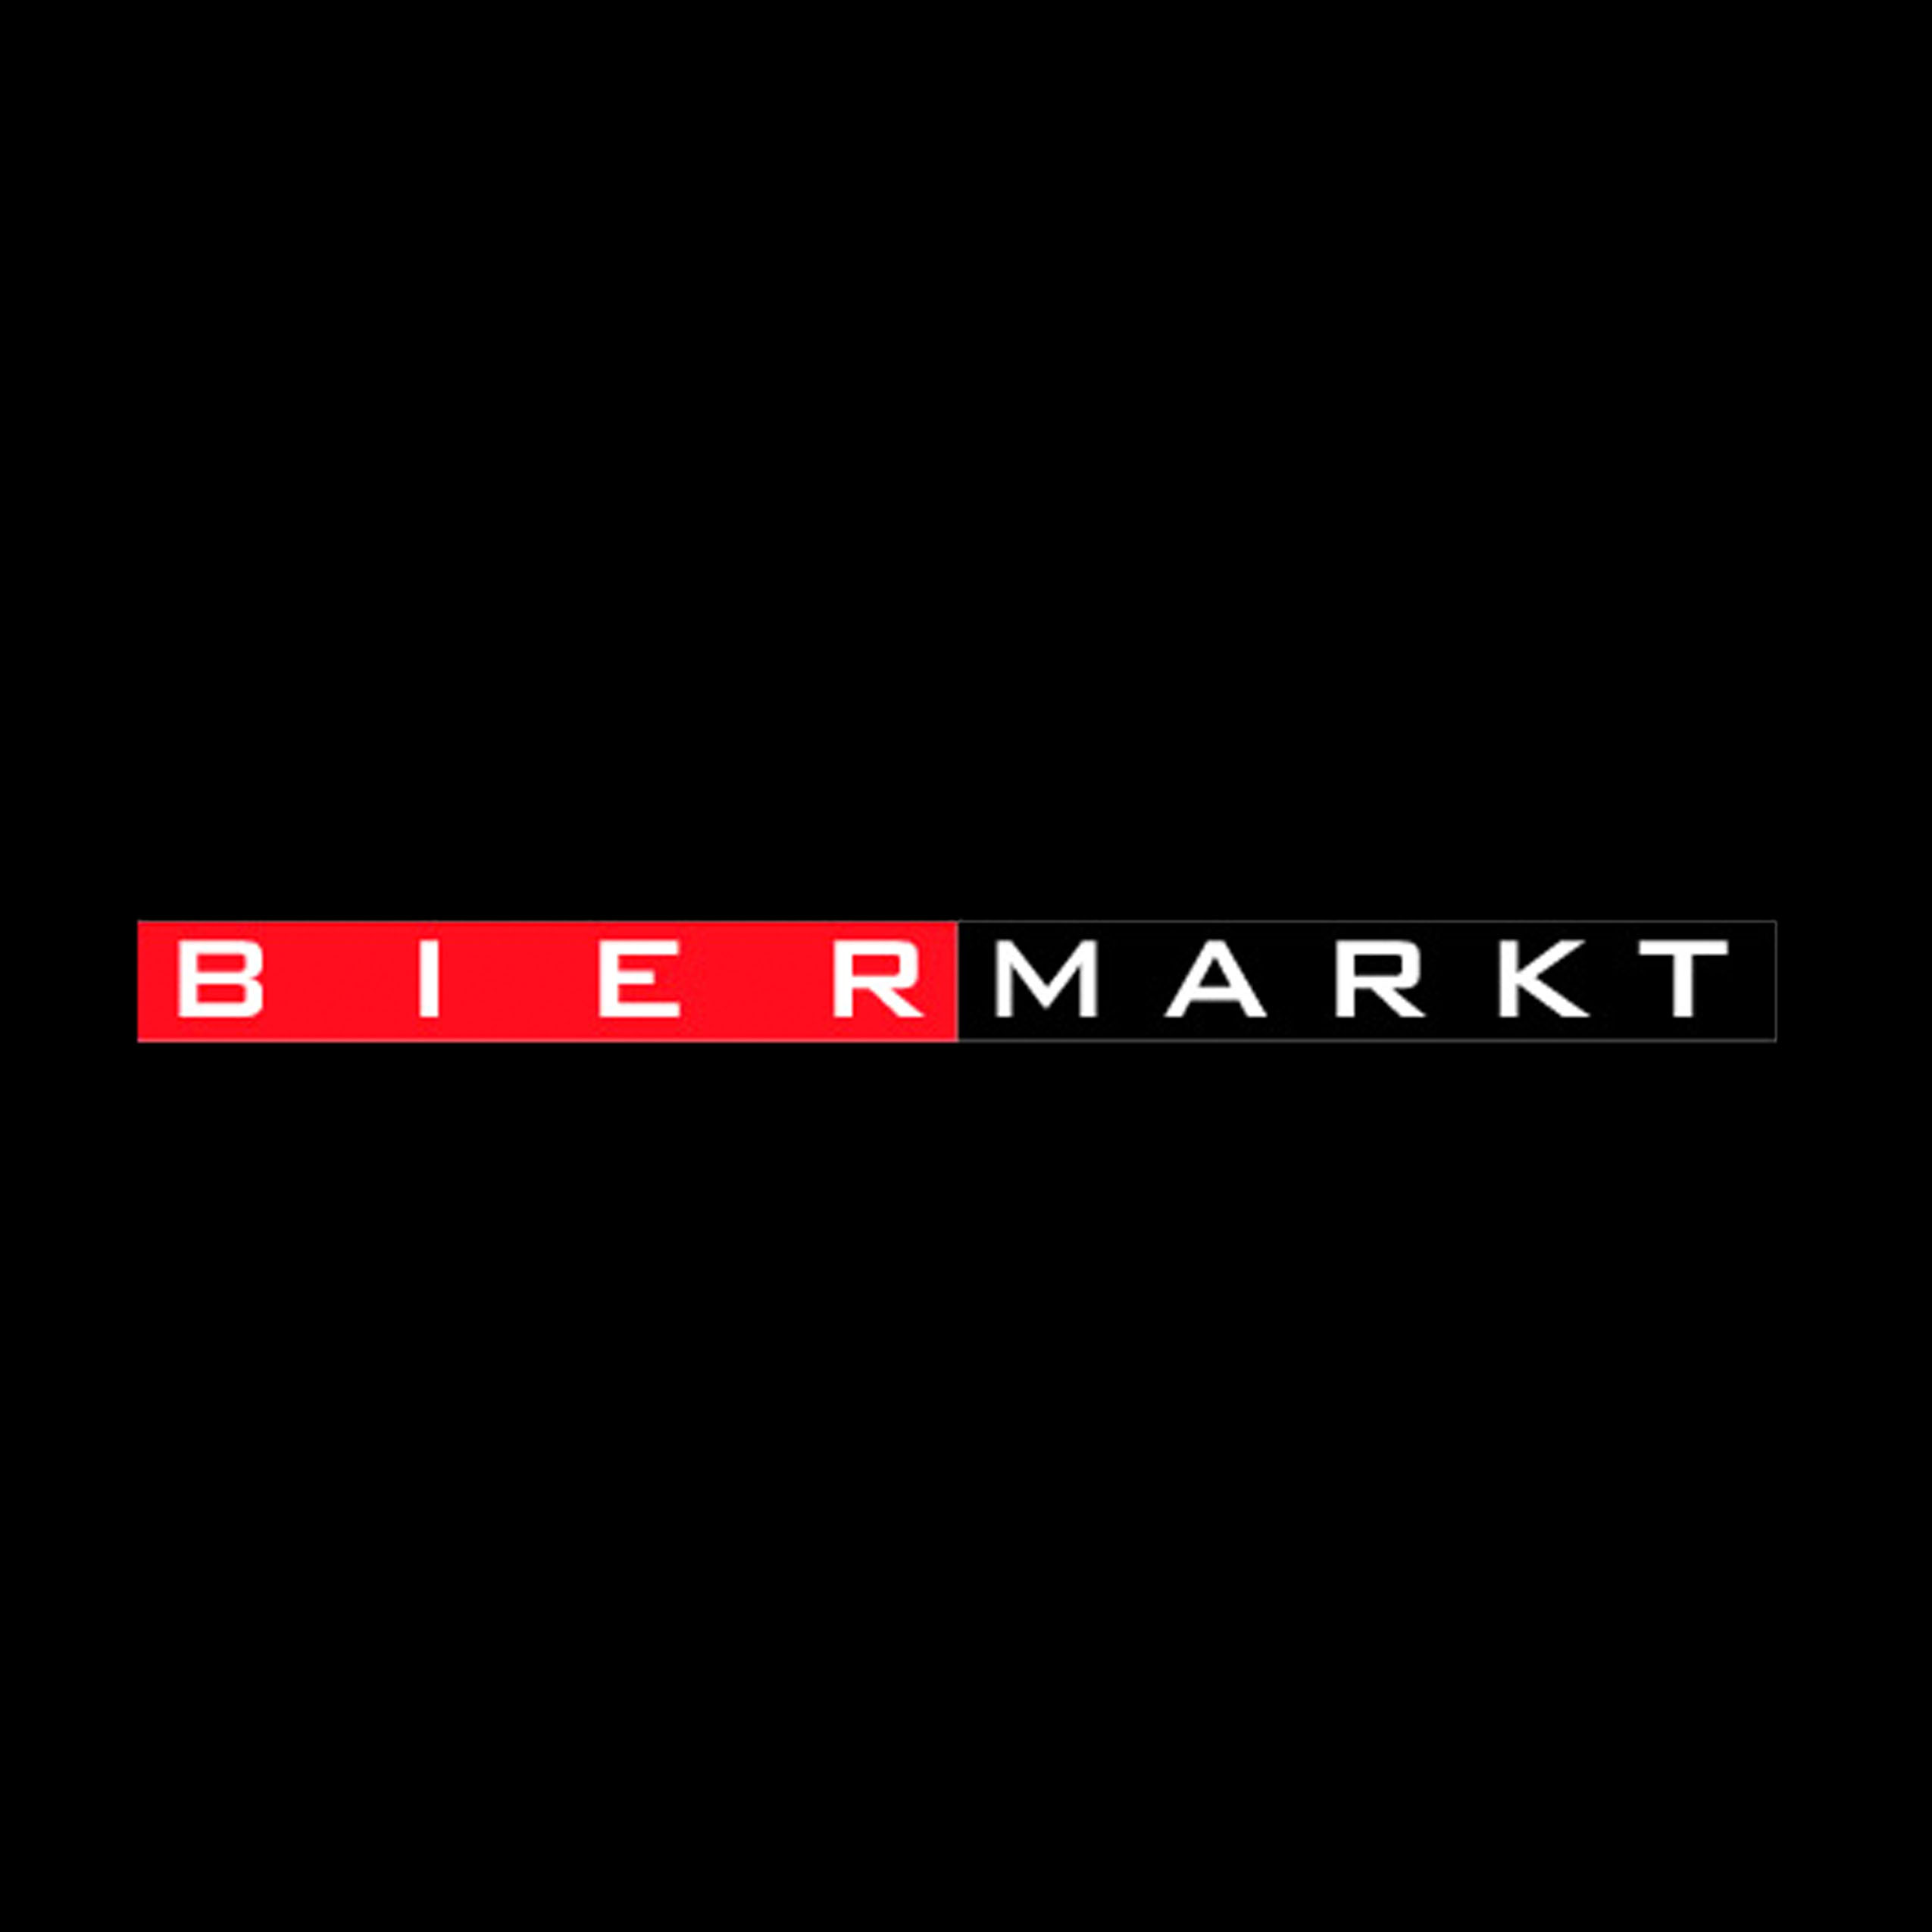 Bier Markt logo